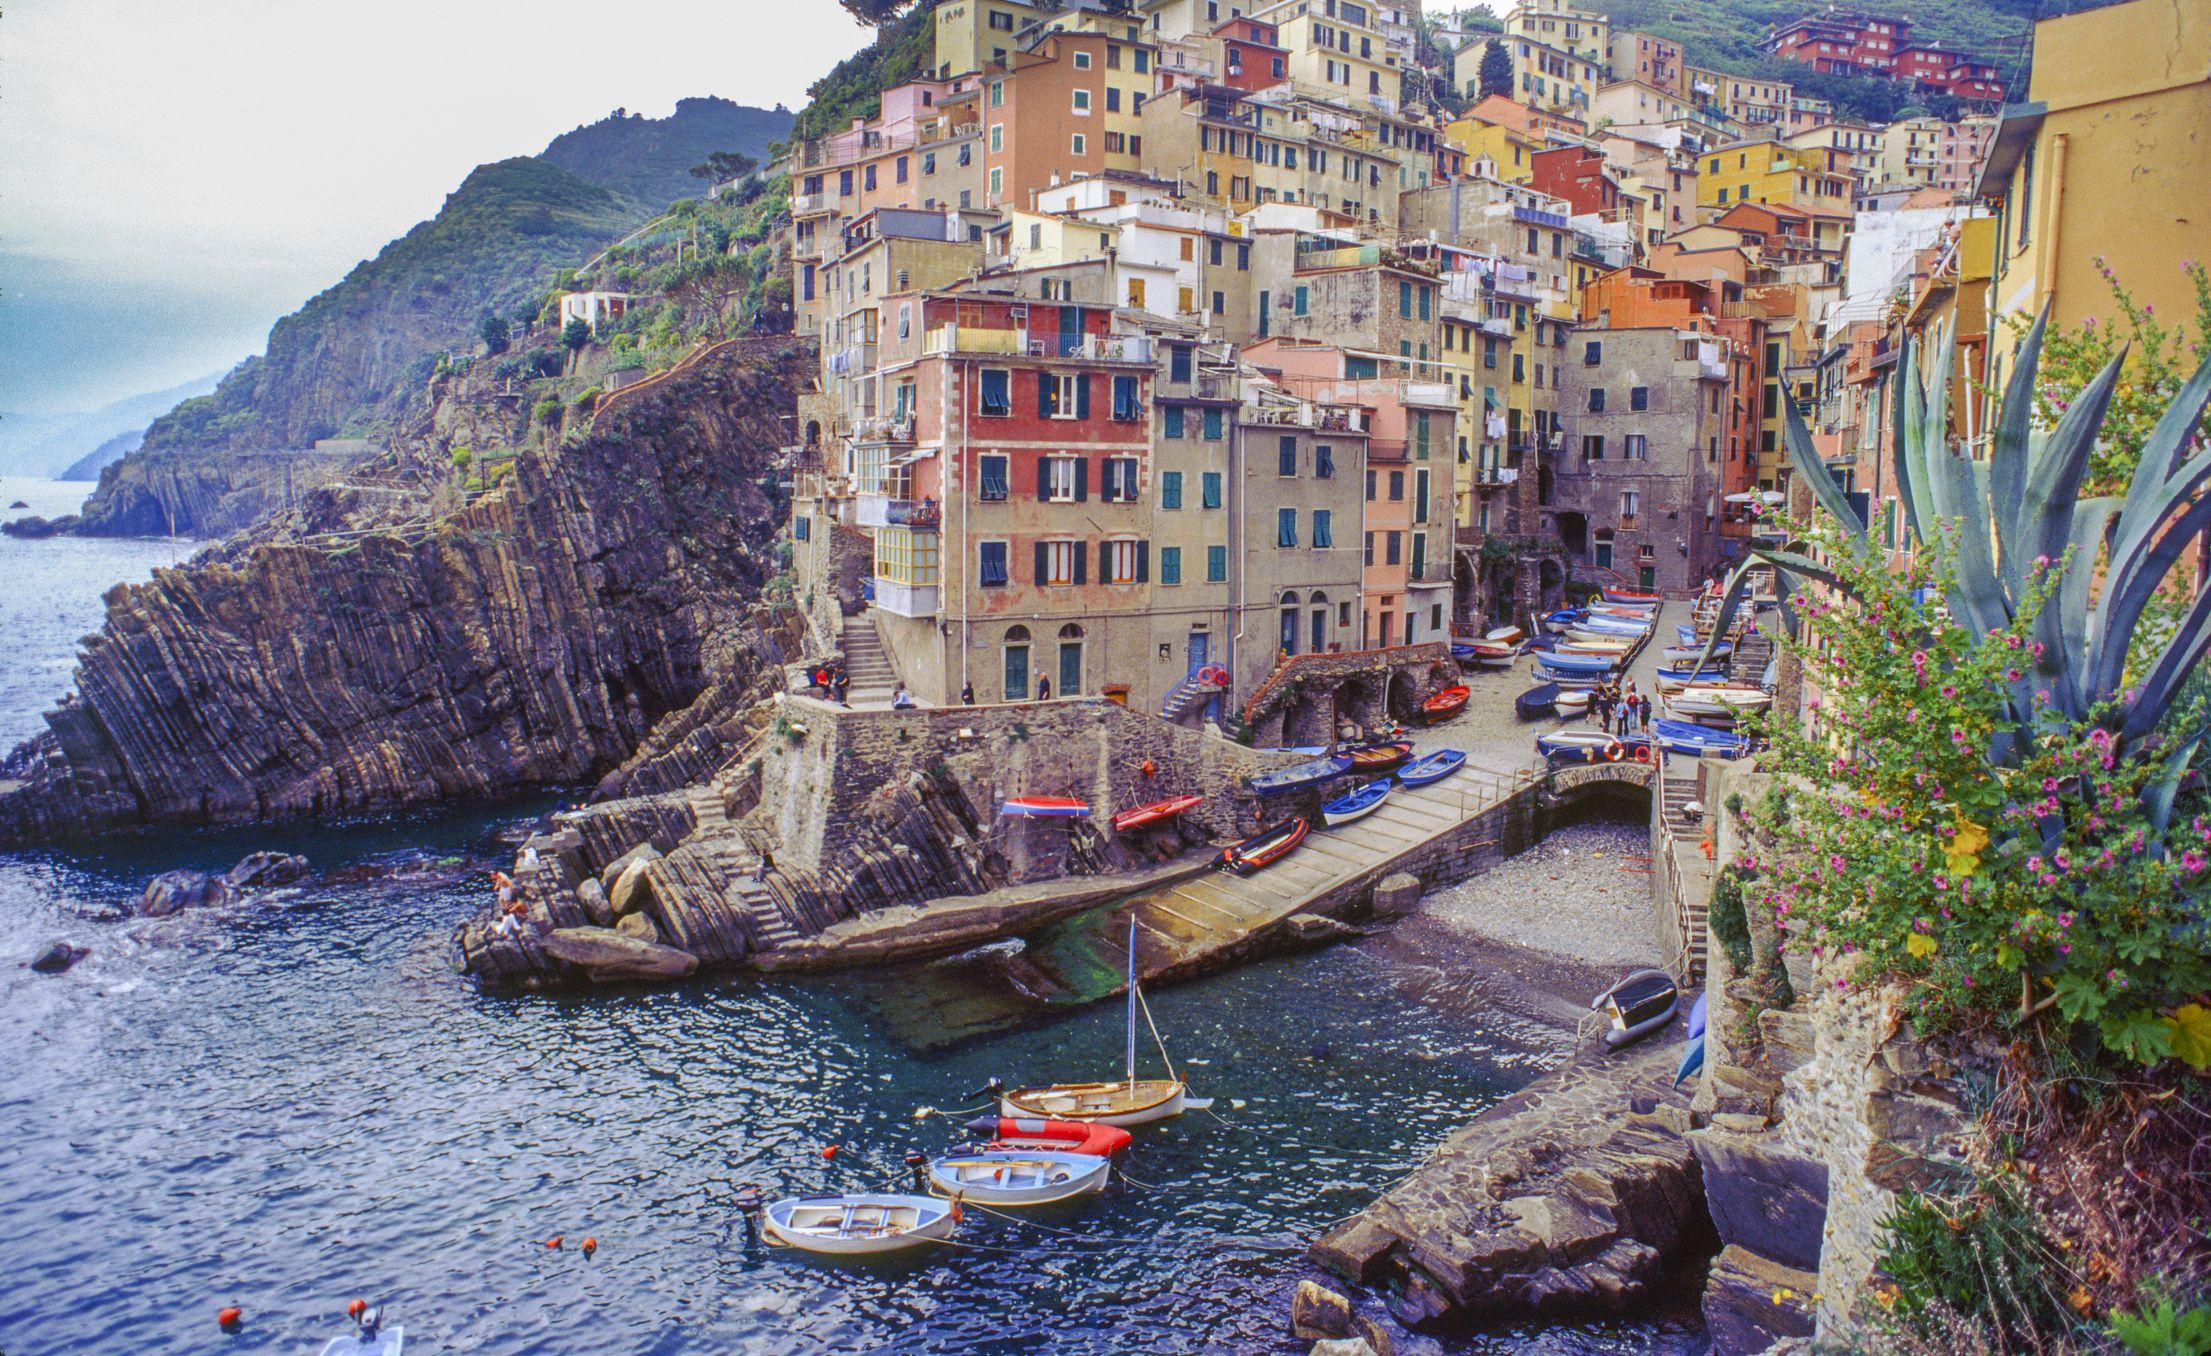 Village of Riomaggiore, Cinque Terre Italy